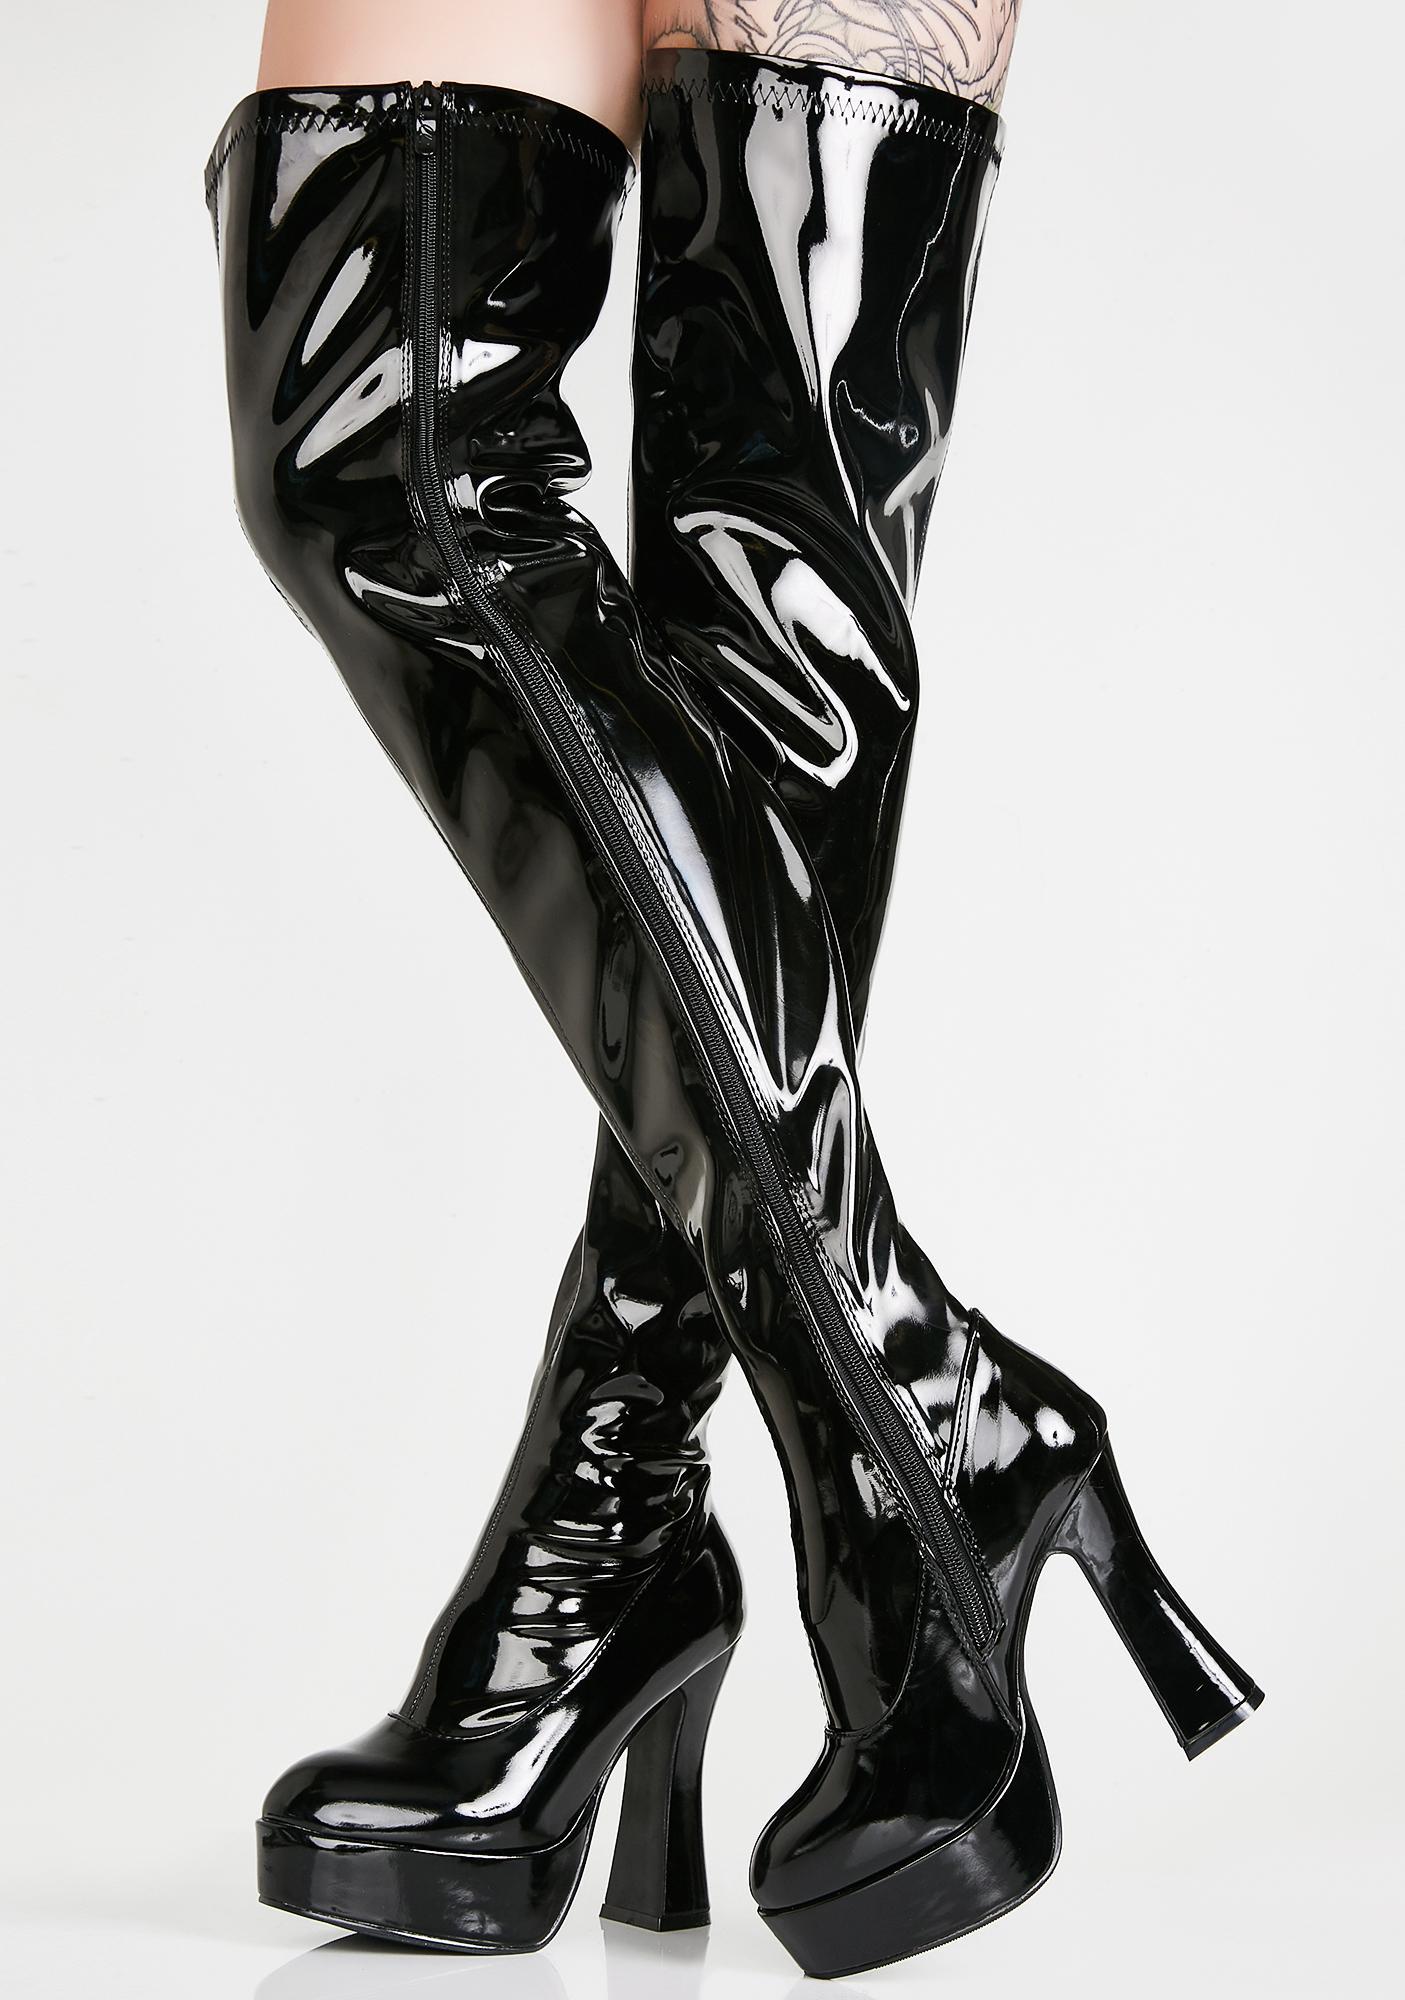 5456f384428 Wicked Desire Platform Boots